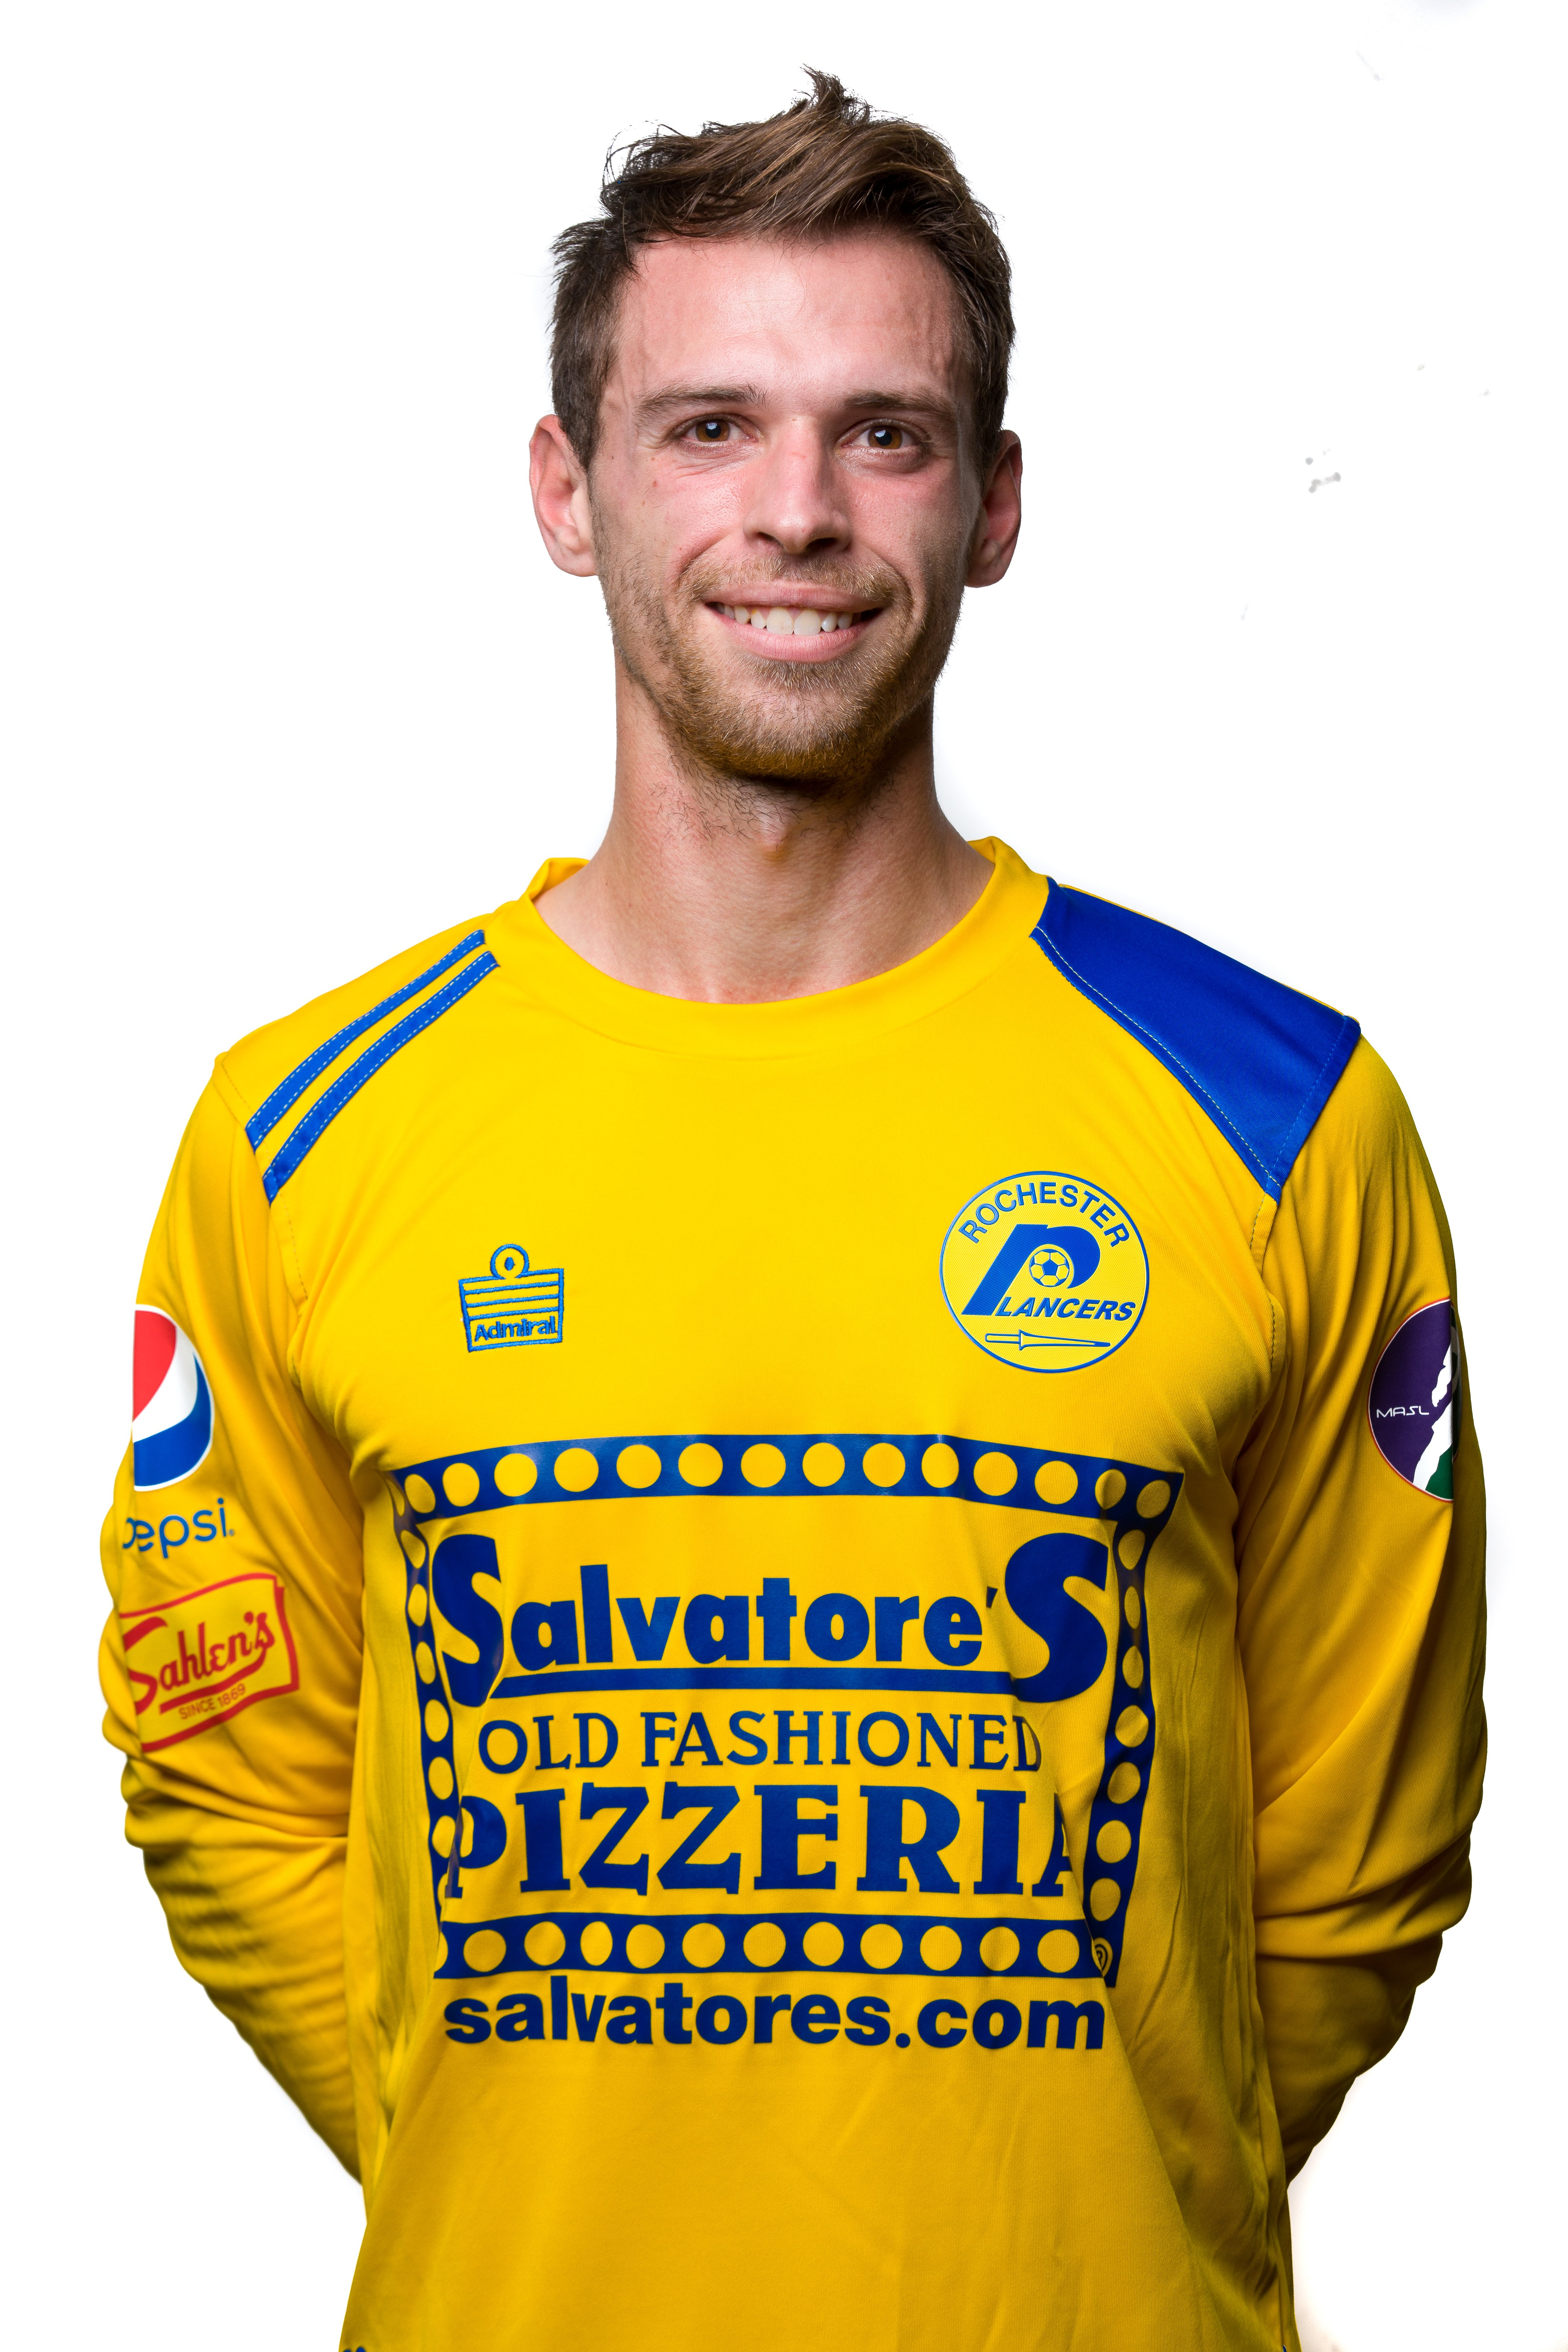 Bryan Wolanski